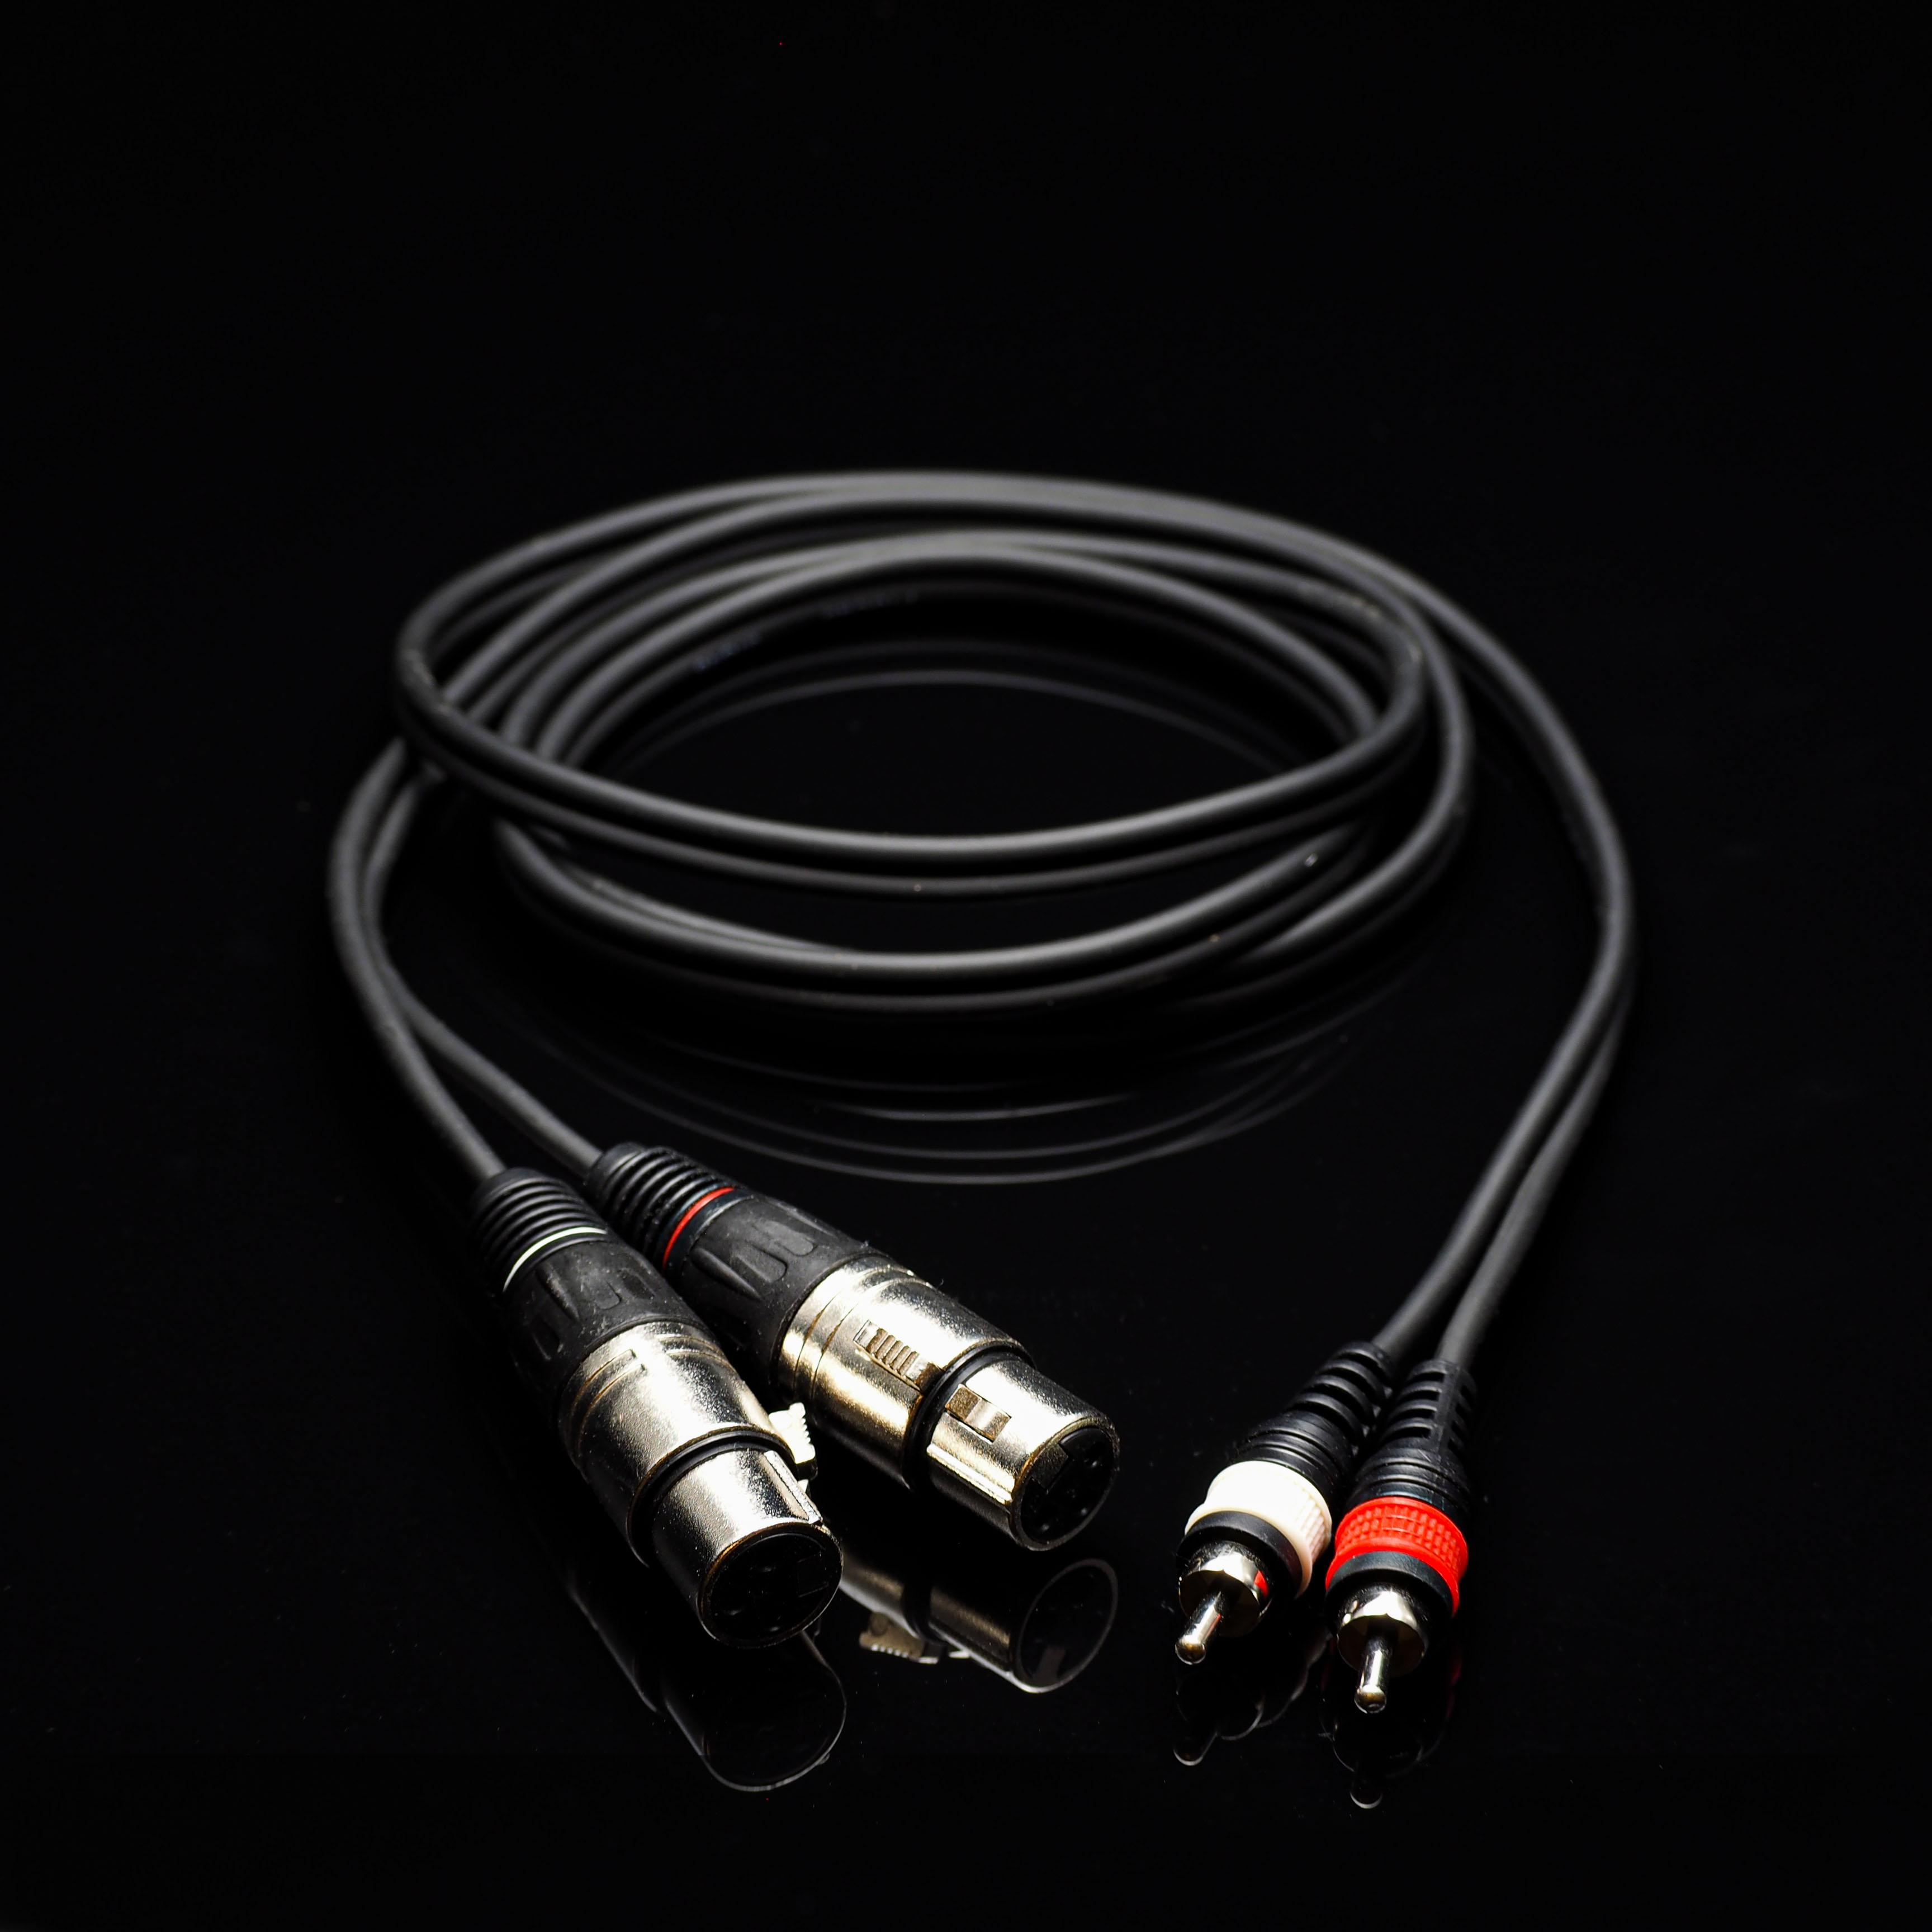 Connector Cable Cinch - Xlr Female